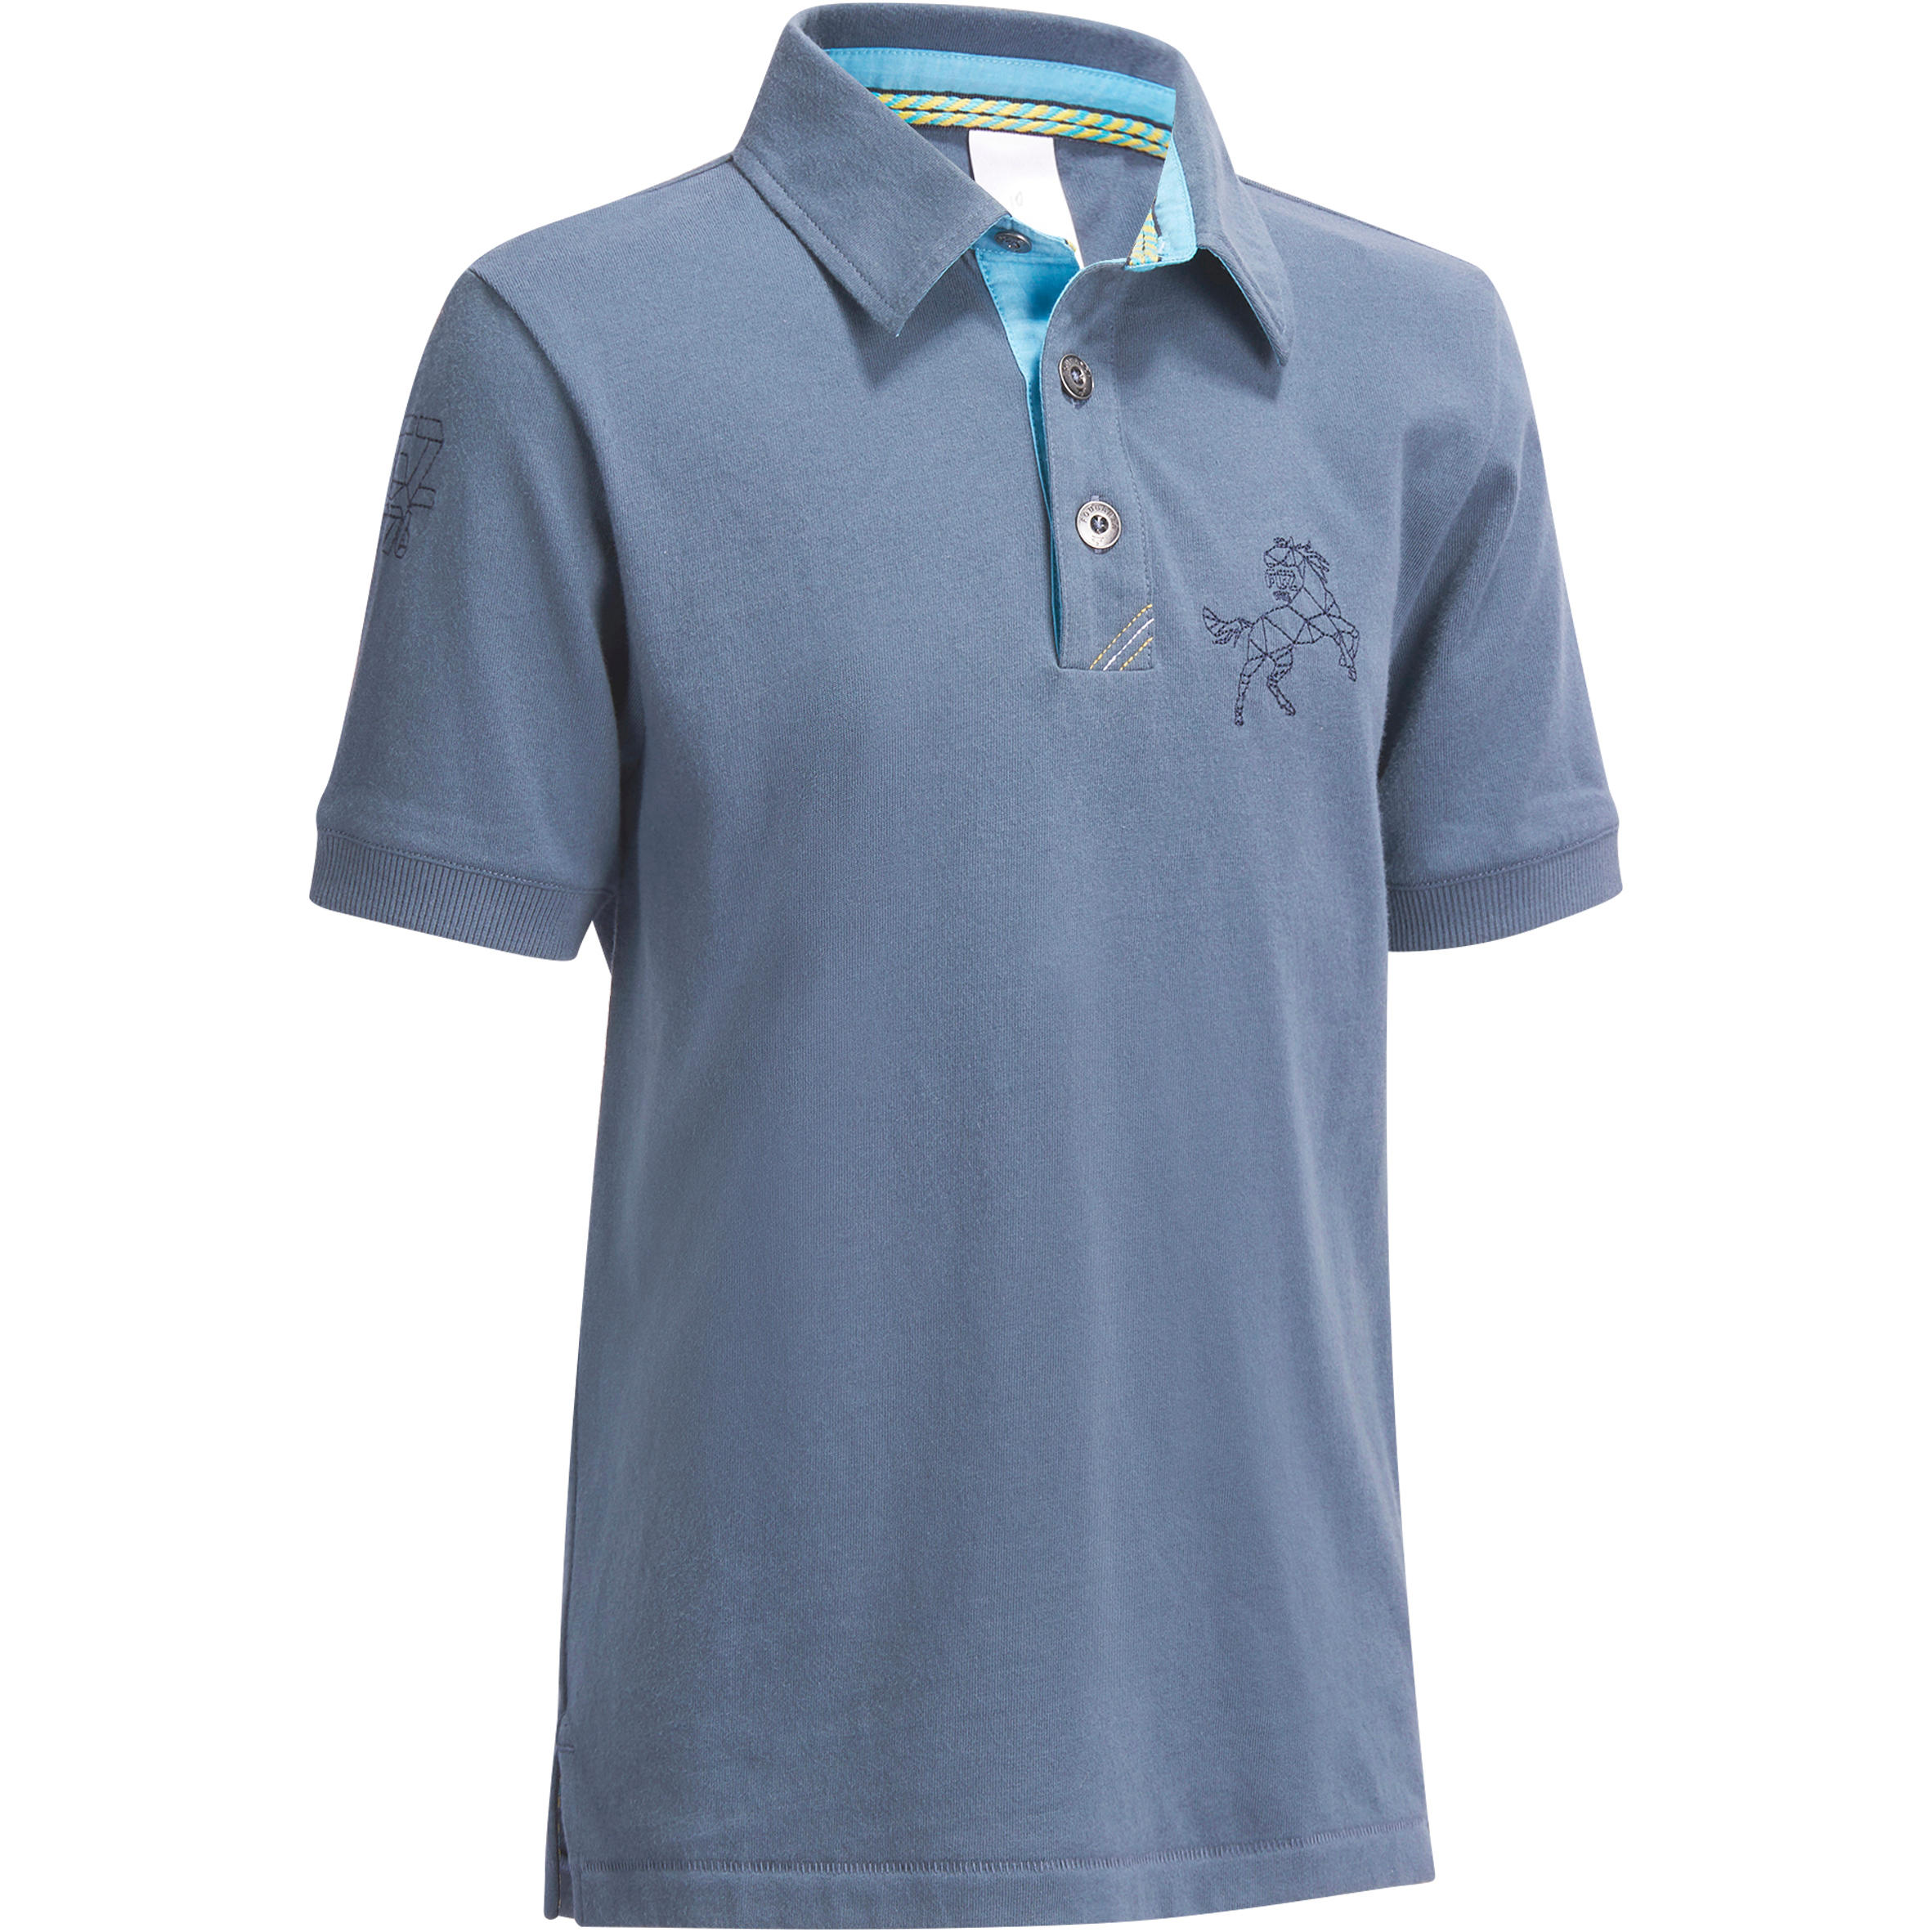 Fouganza Polo korte mouwen ruitersport jongens PL140 grijsblauw